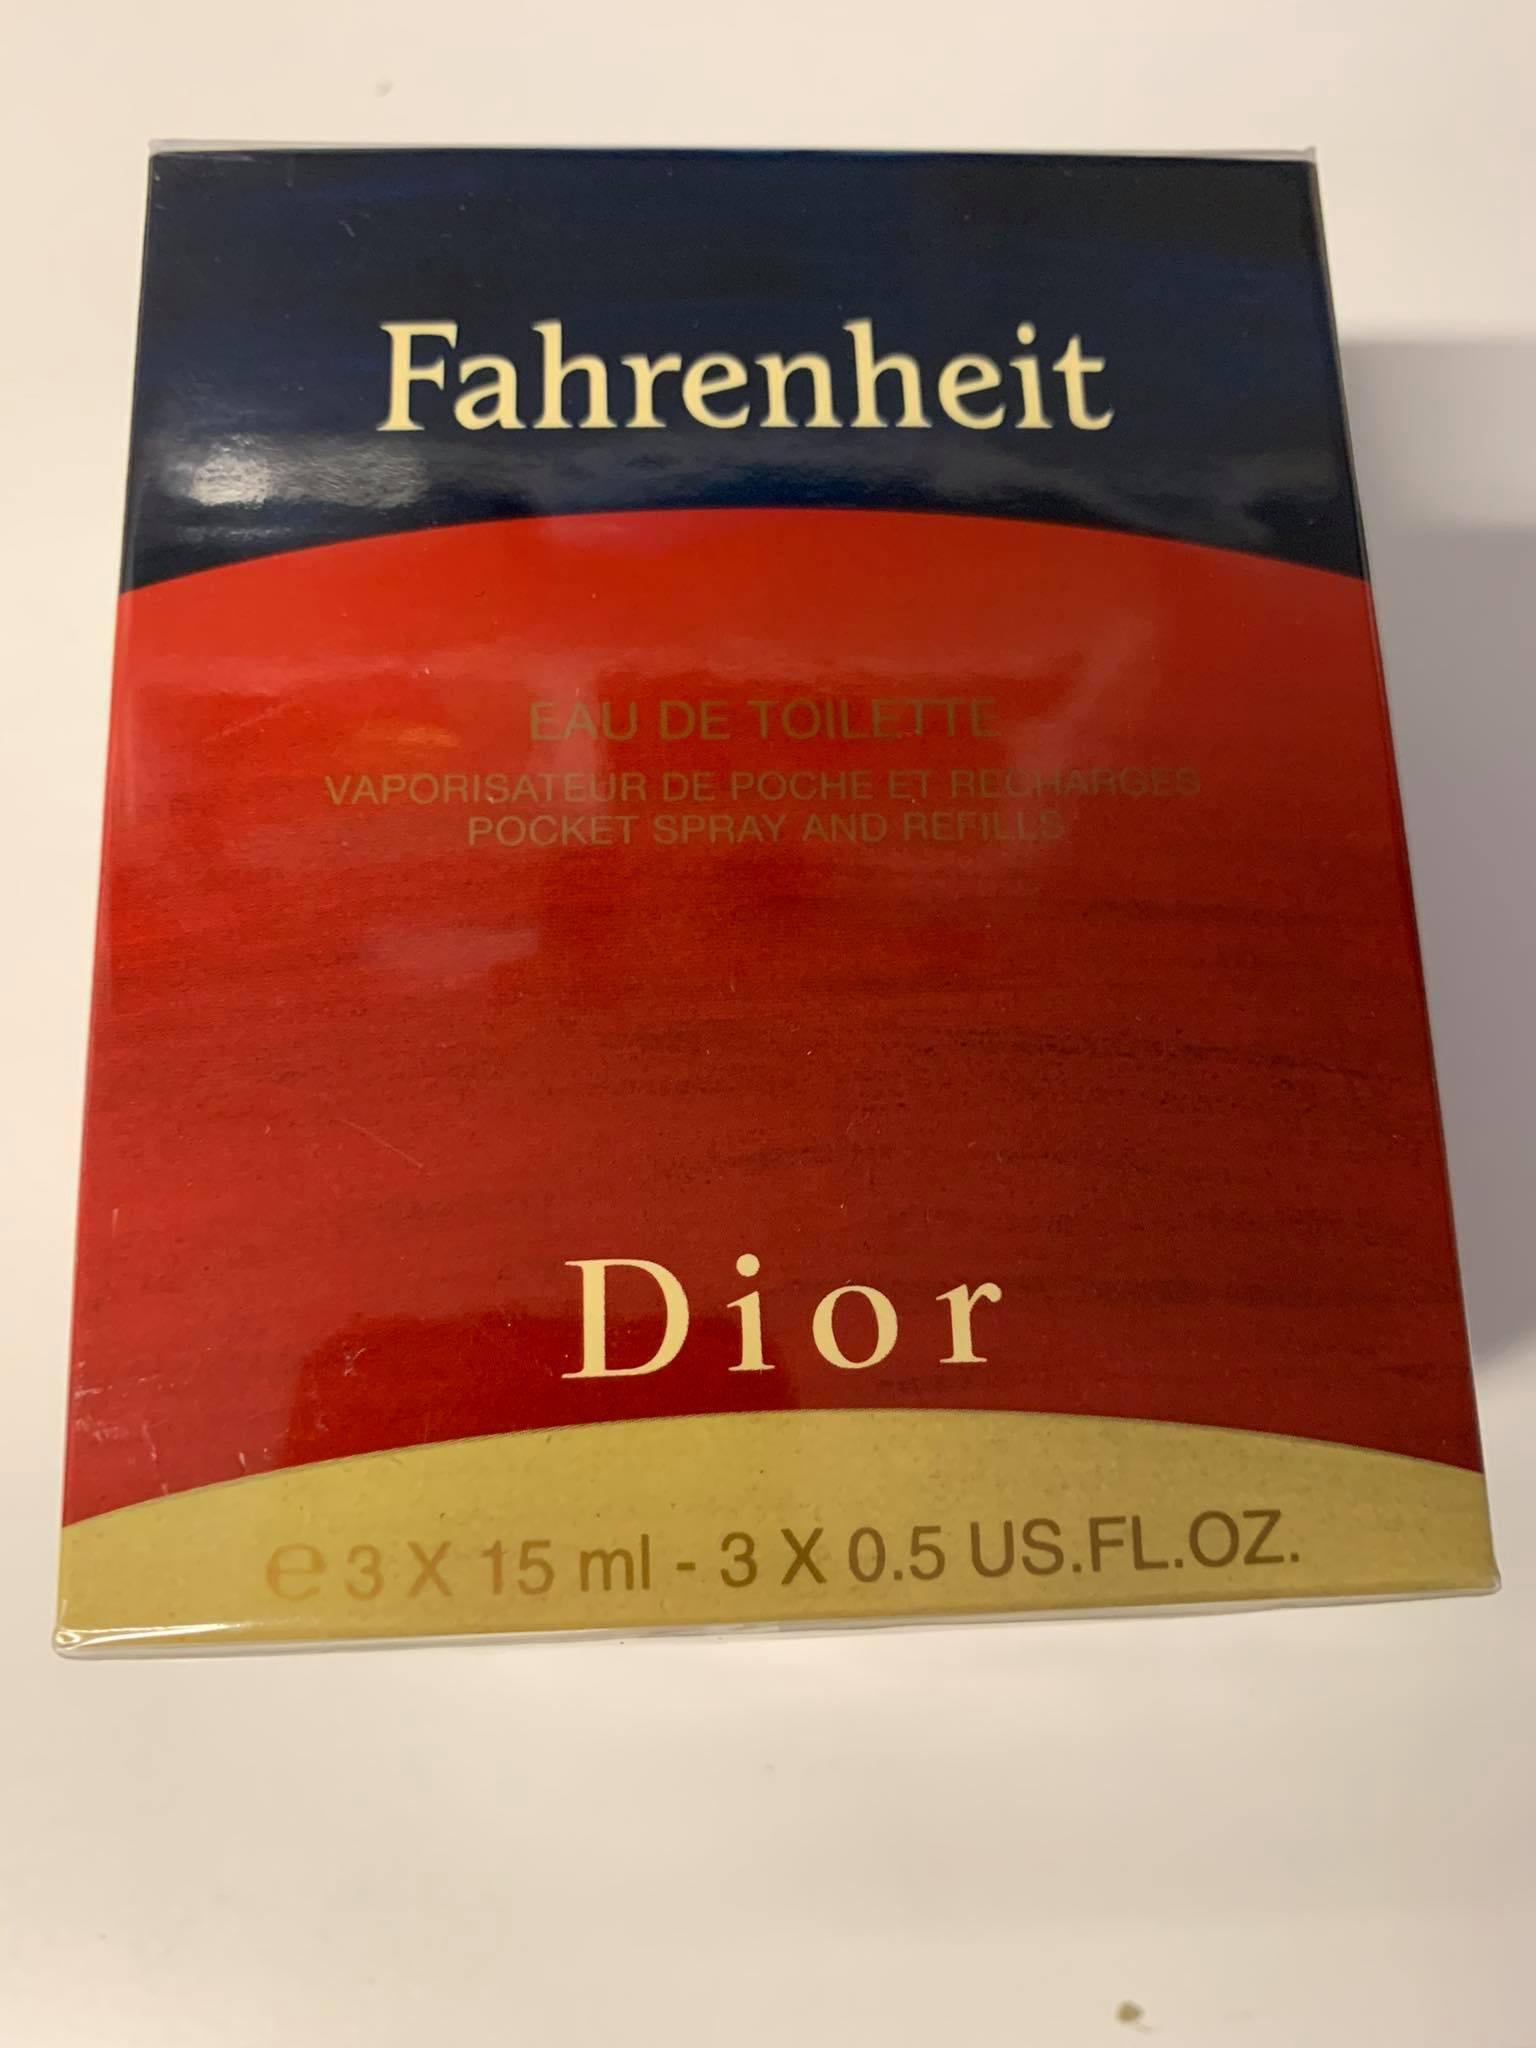 Christian Dior Fahrenheit, edt 3x15ml